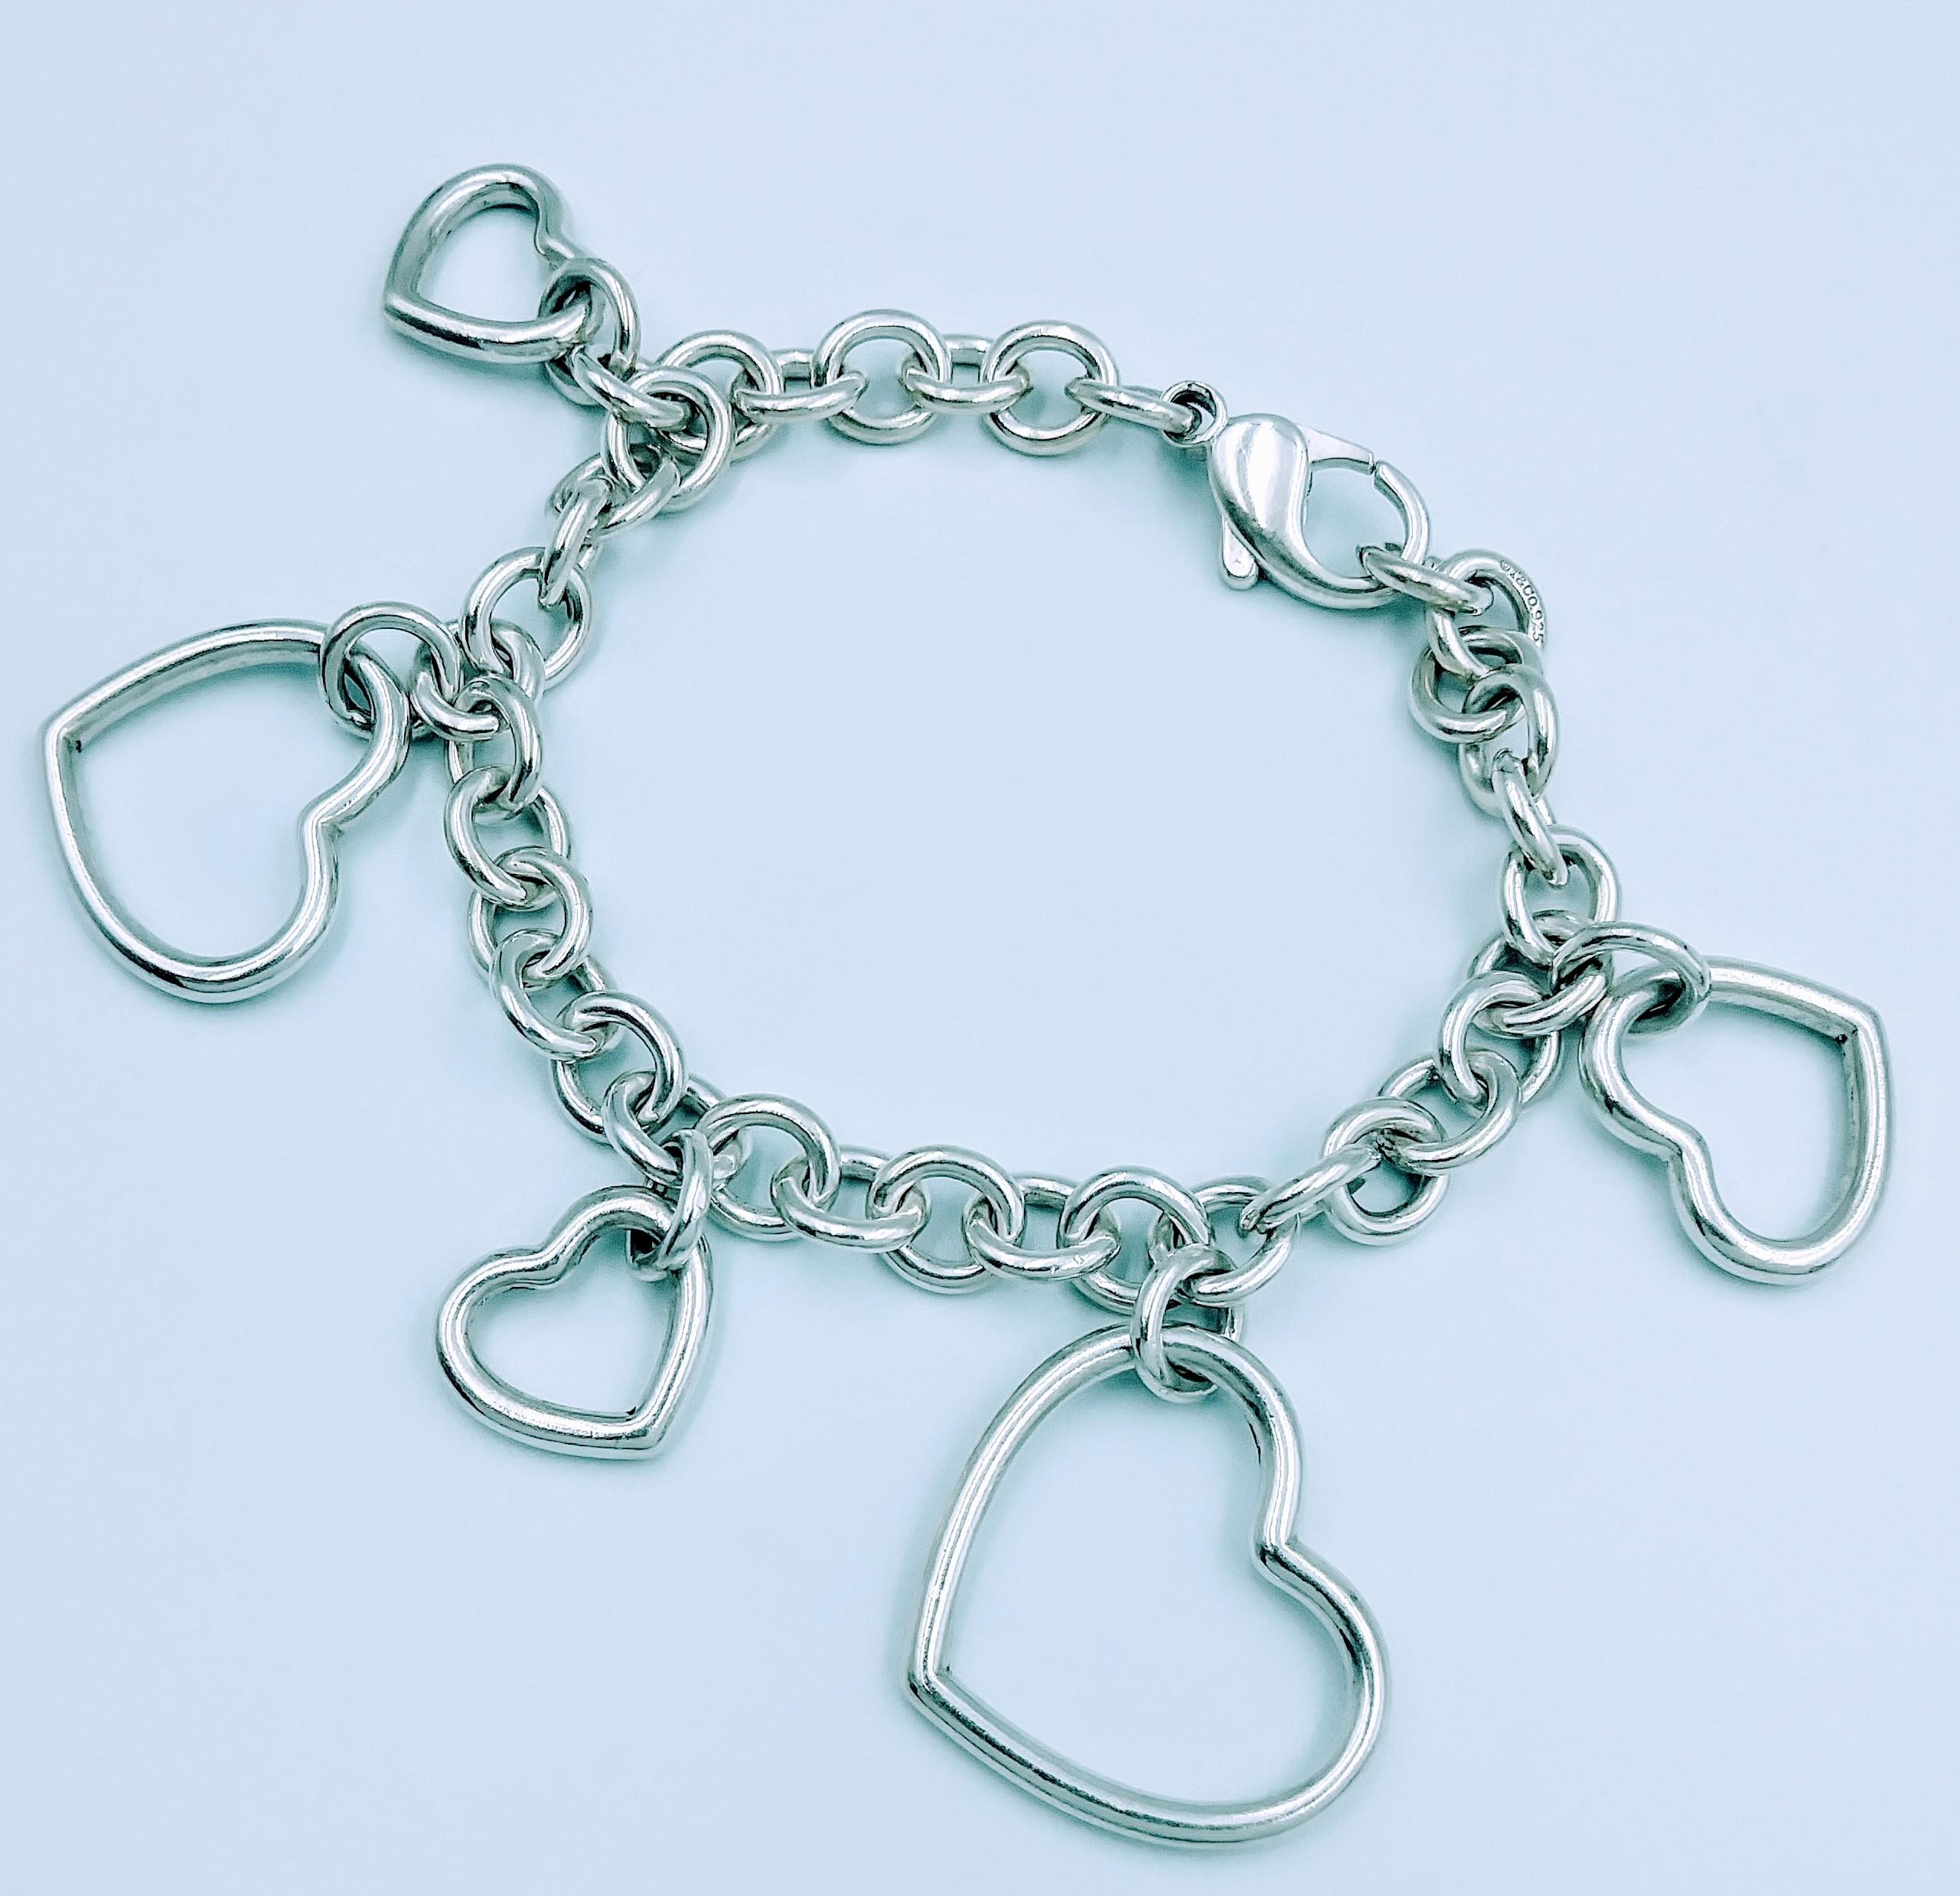 Tiffany & Co 925 Sterling Silver Five Heart Charms Bracelet 7.5